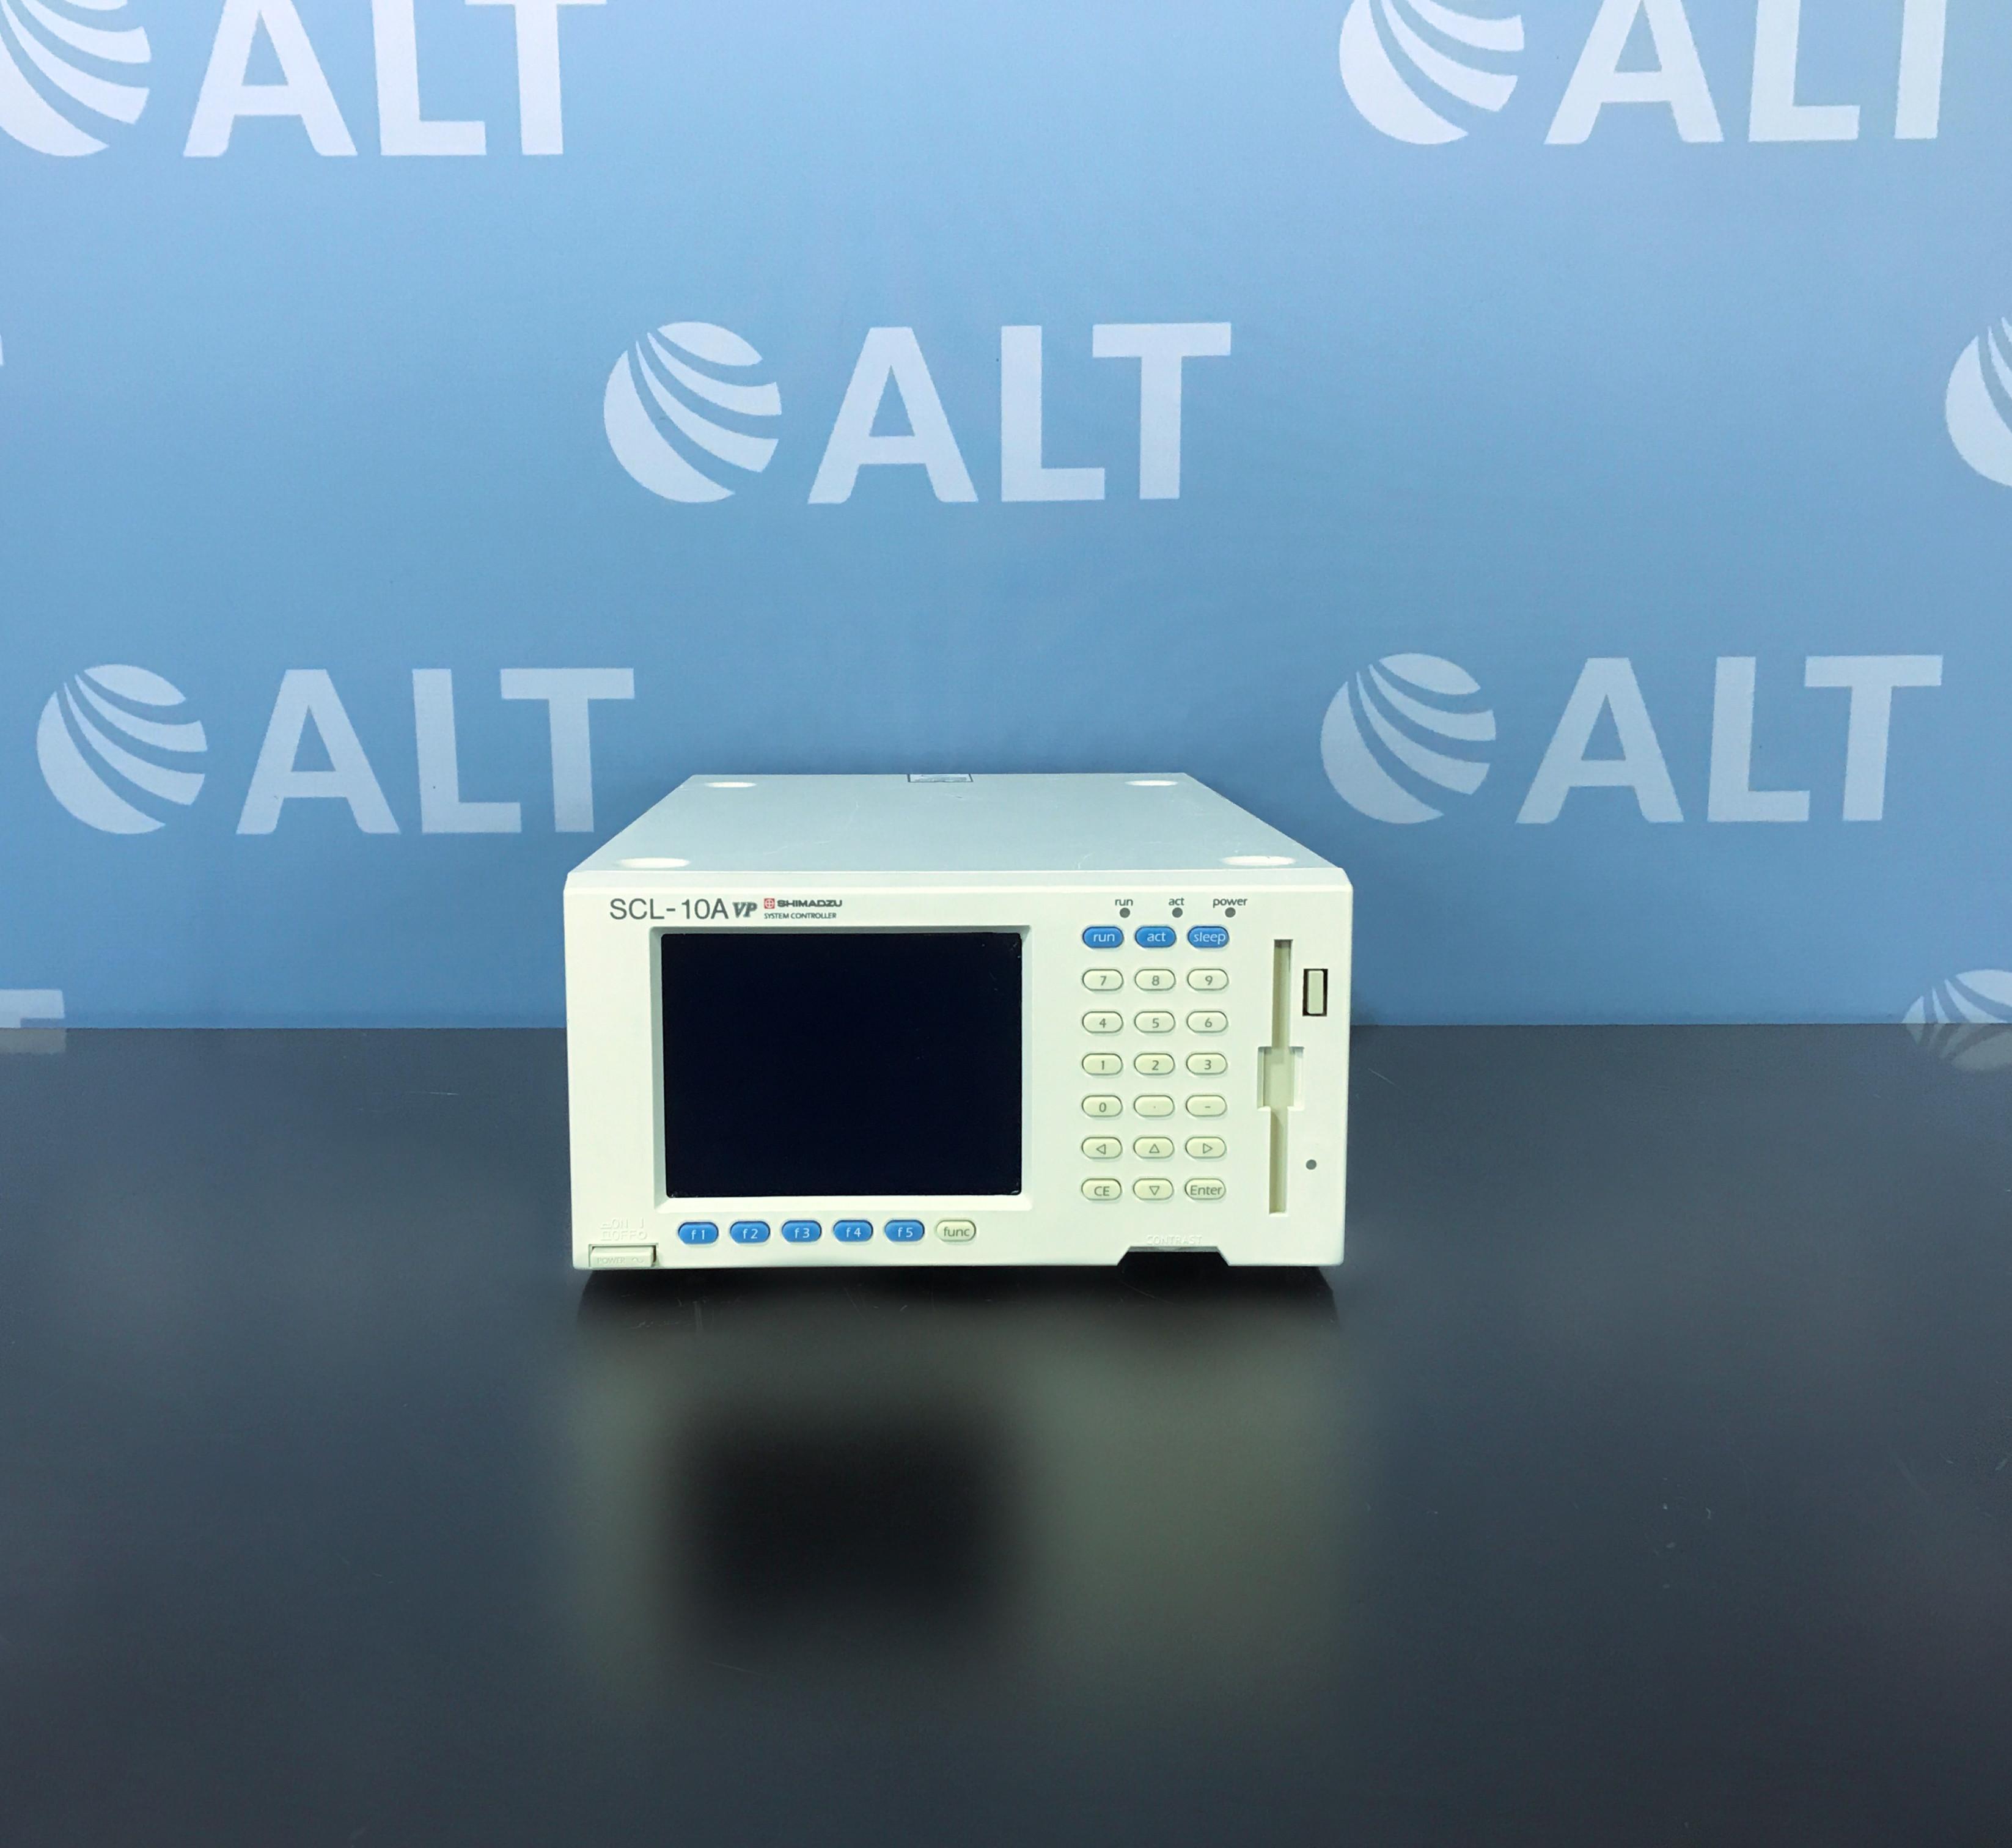 Shimadzu SCL-10Avp System Controller Image